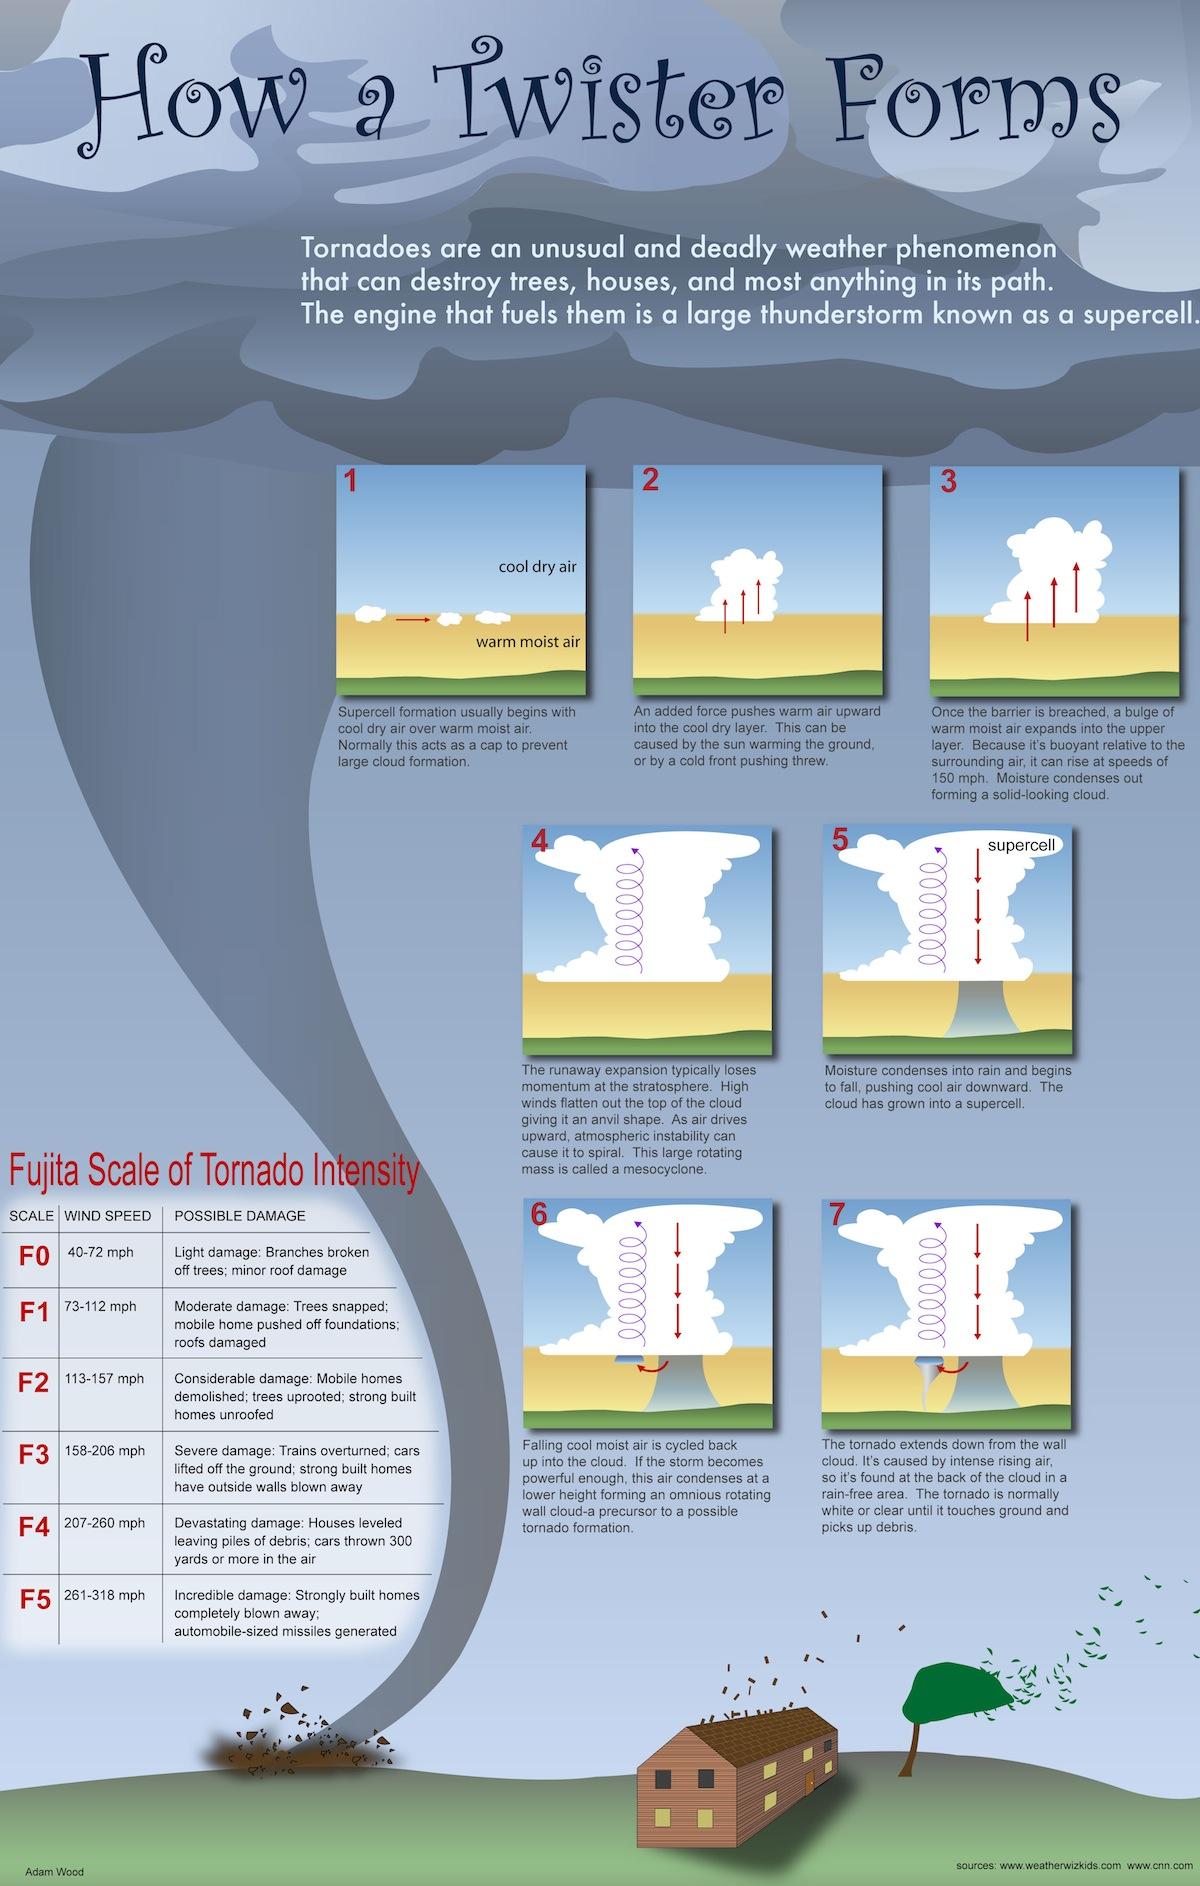 How do tornadoes form? – 34 Kiwis